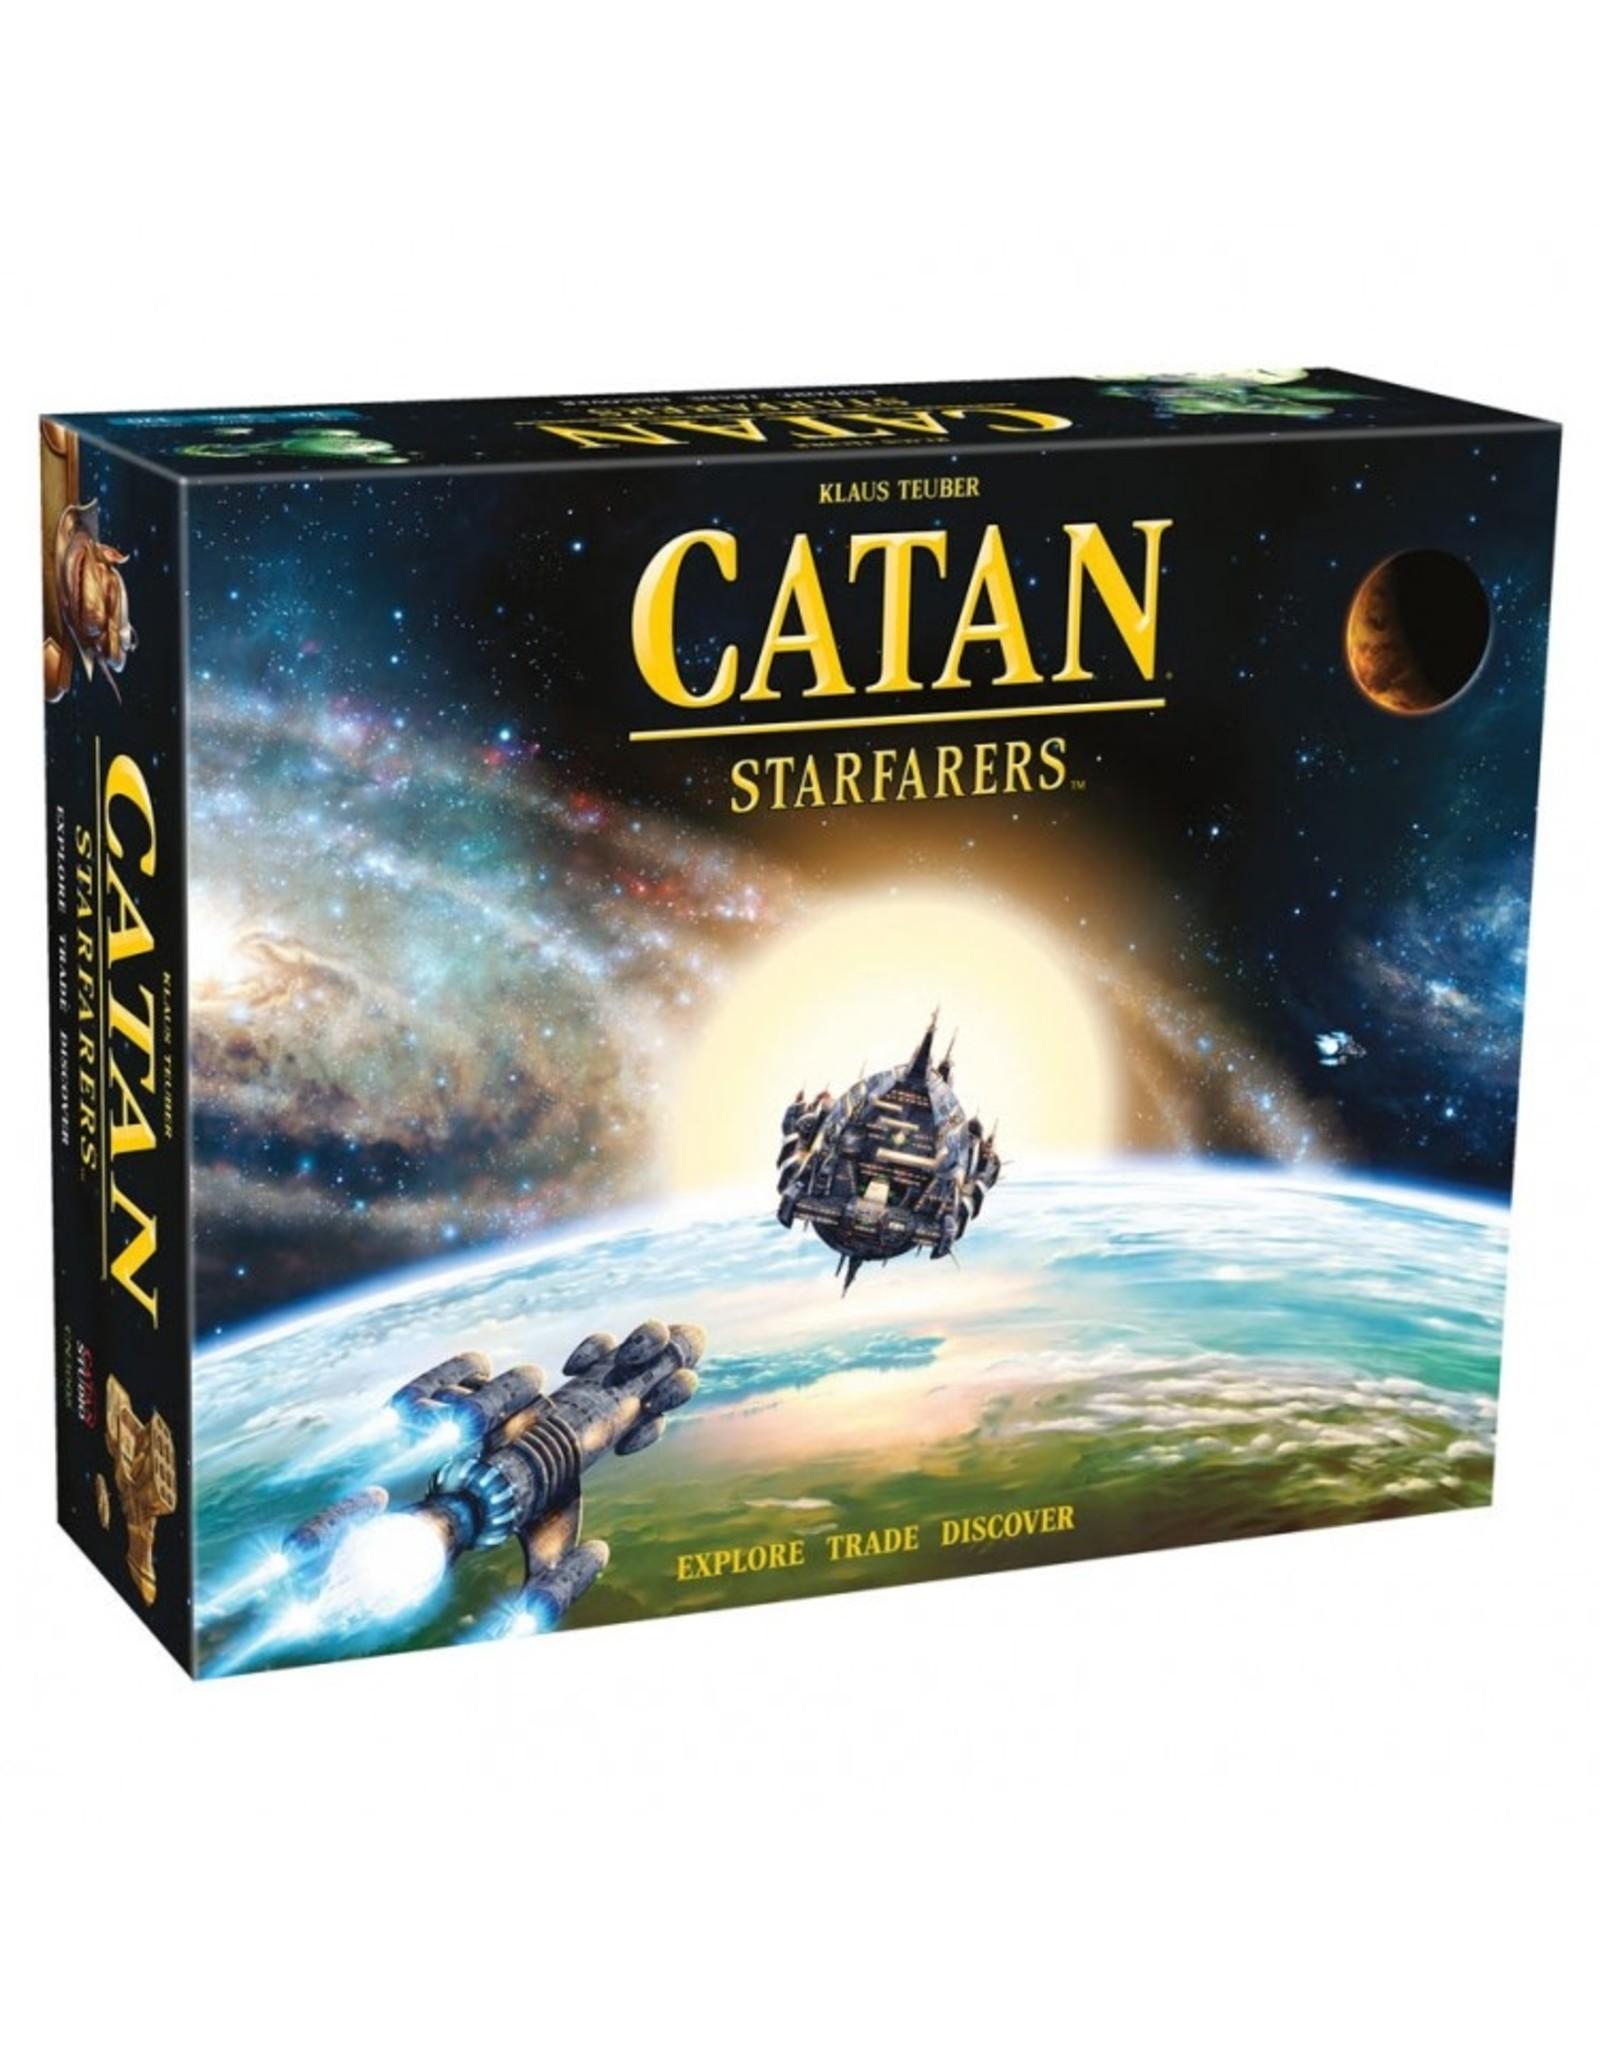 Catan Studios Catan Starfarers 2nd Edition